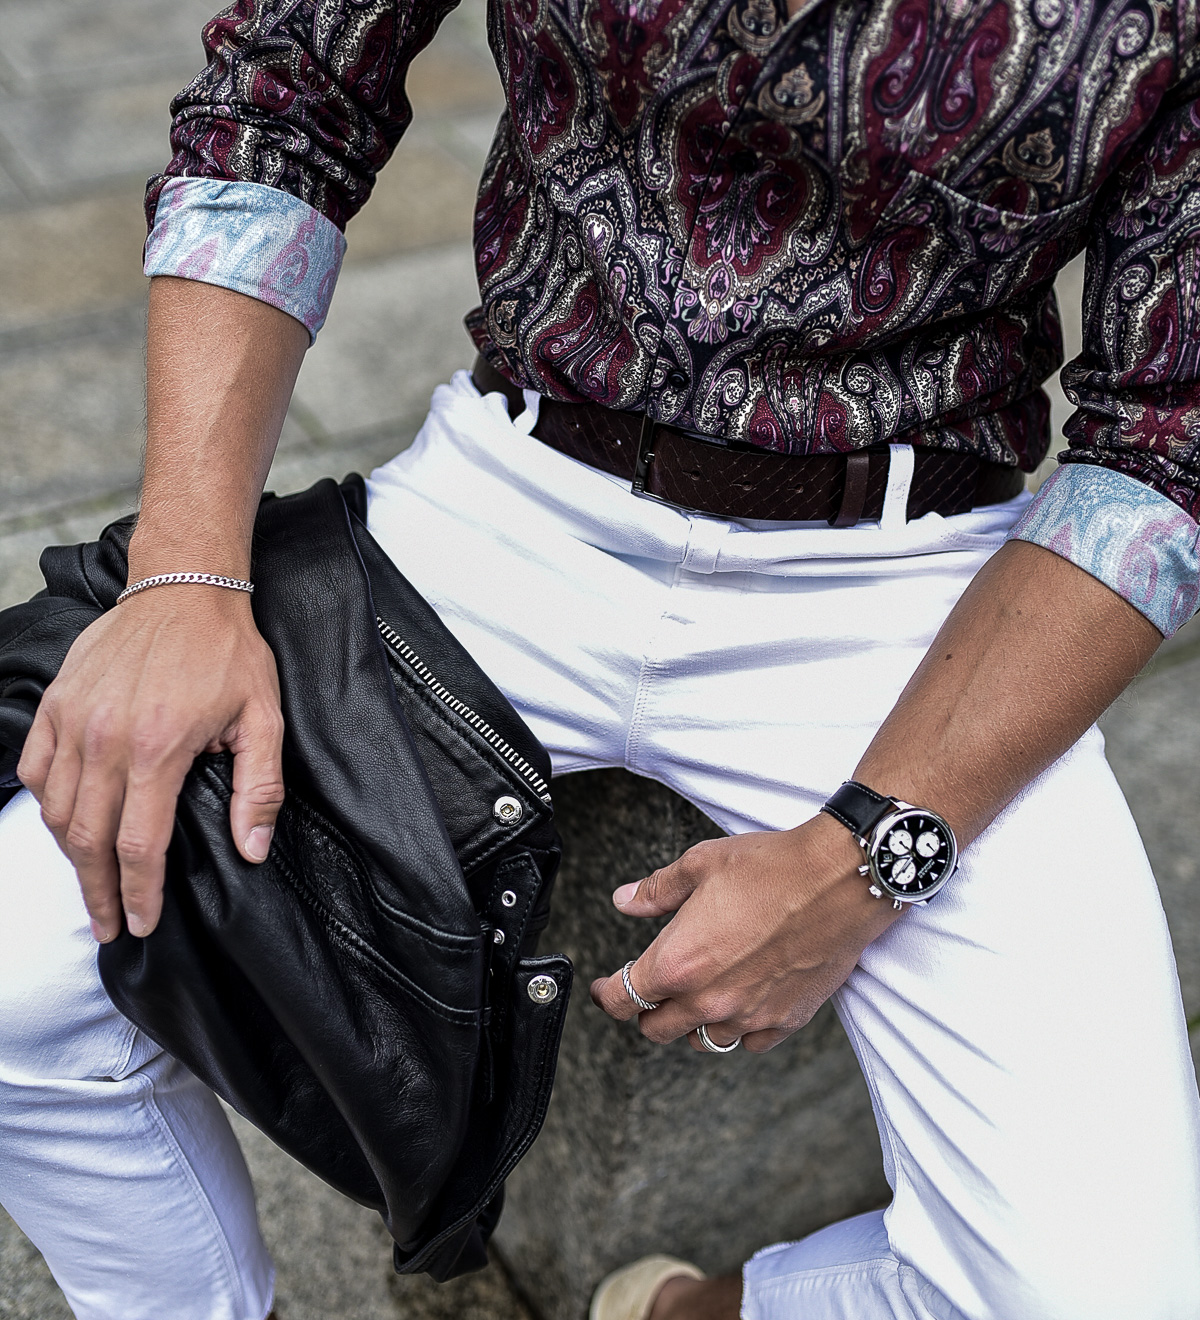 Tommeezjerry-Maennermodeblog-Maennermode-Fashionblog-Styleblog-Berlinblog--Lifestyleblog-Casualchic-Flybelt-Flowershirt-The-Kooples-White-Jeans-Movado-Watch